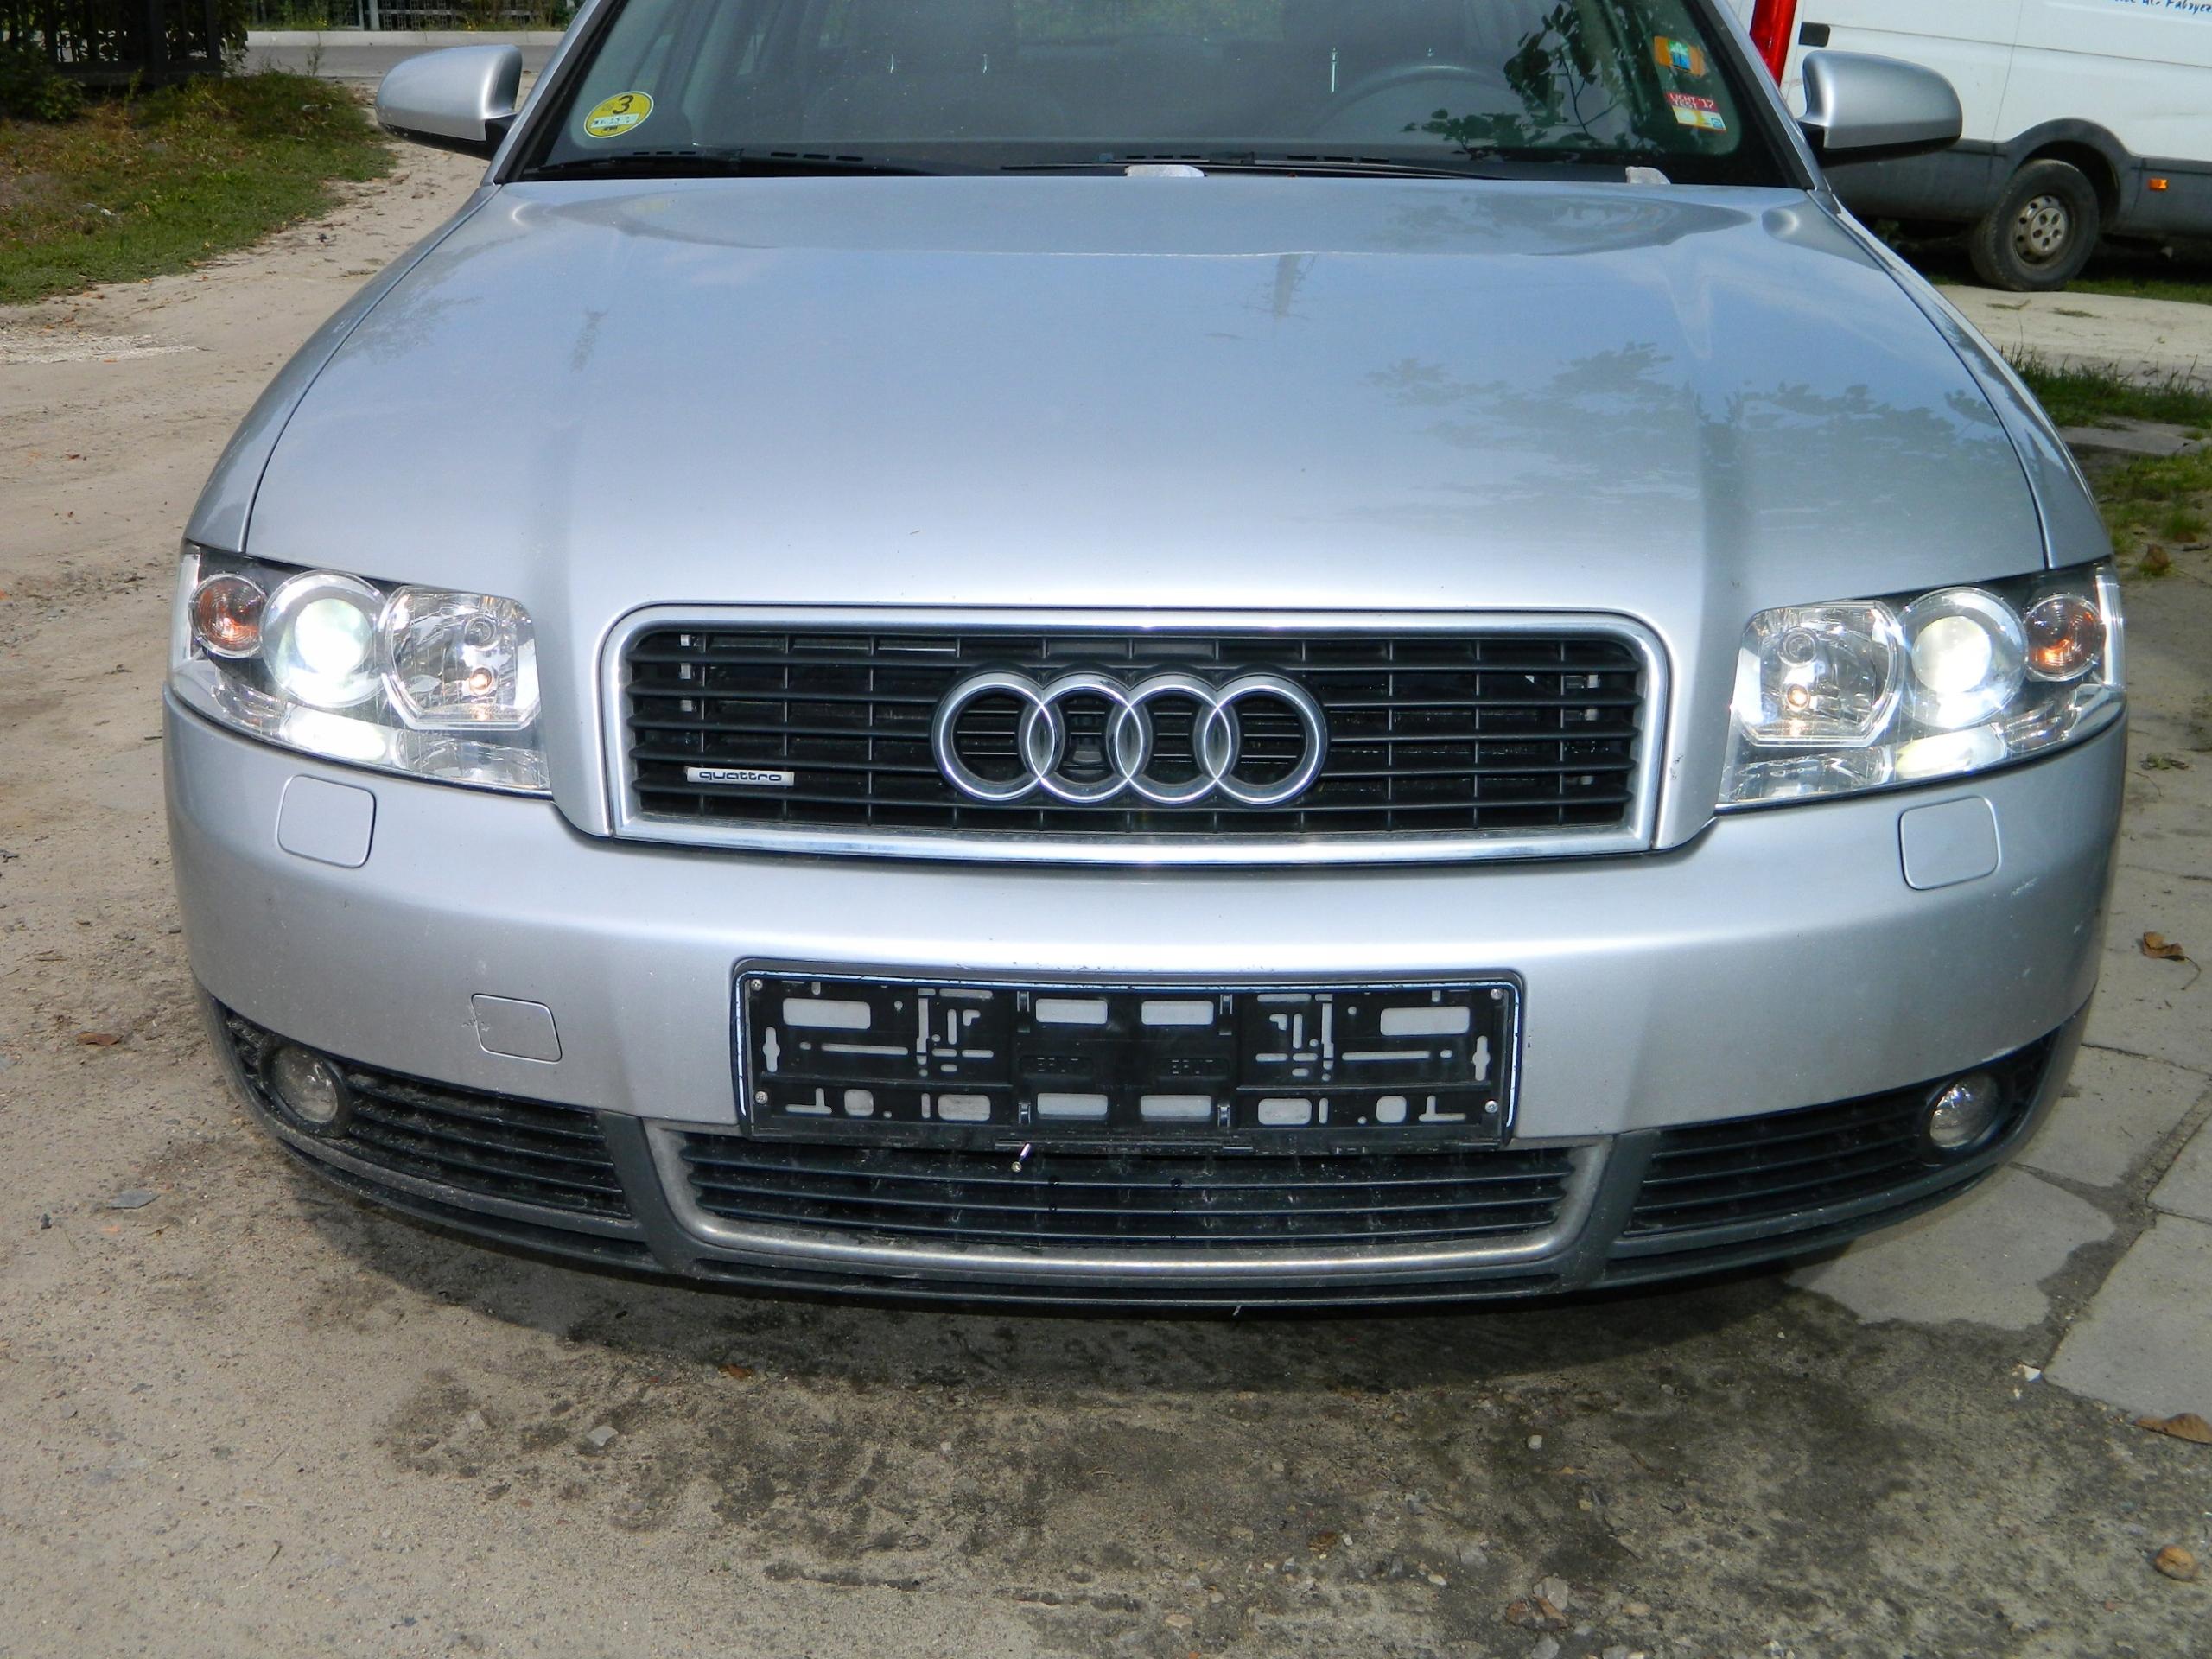 Audi A4 B6 Grill Atrapa Chlodnicy Quattro Ladna 7624178323